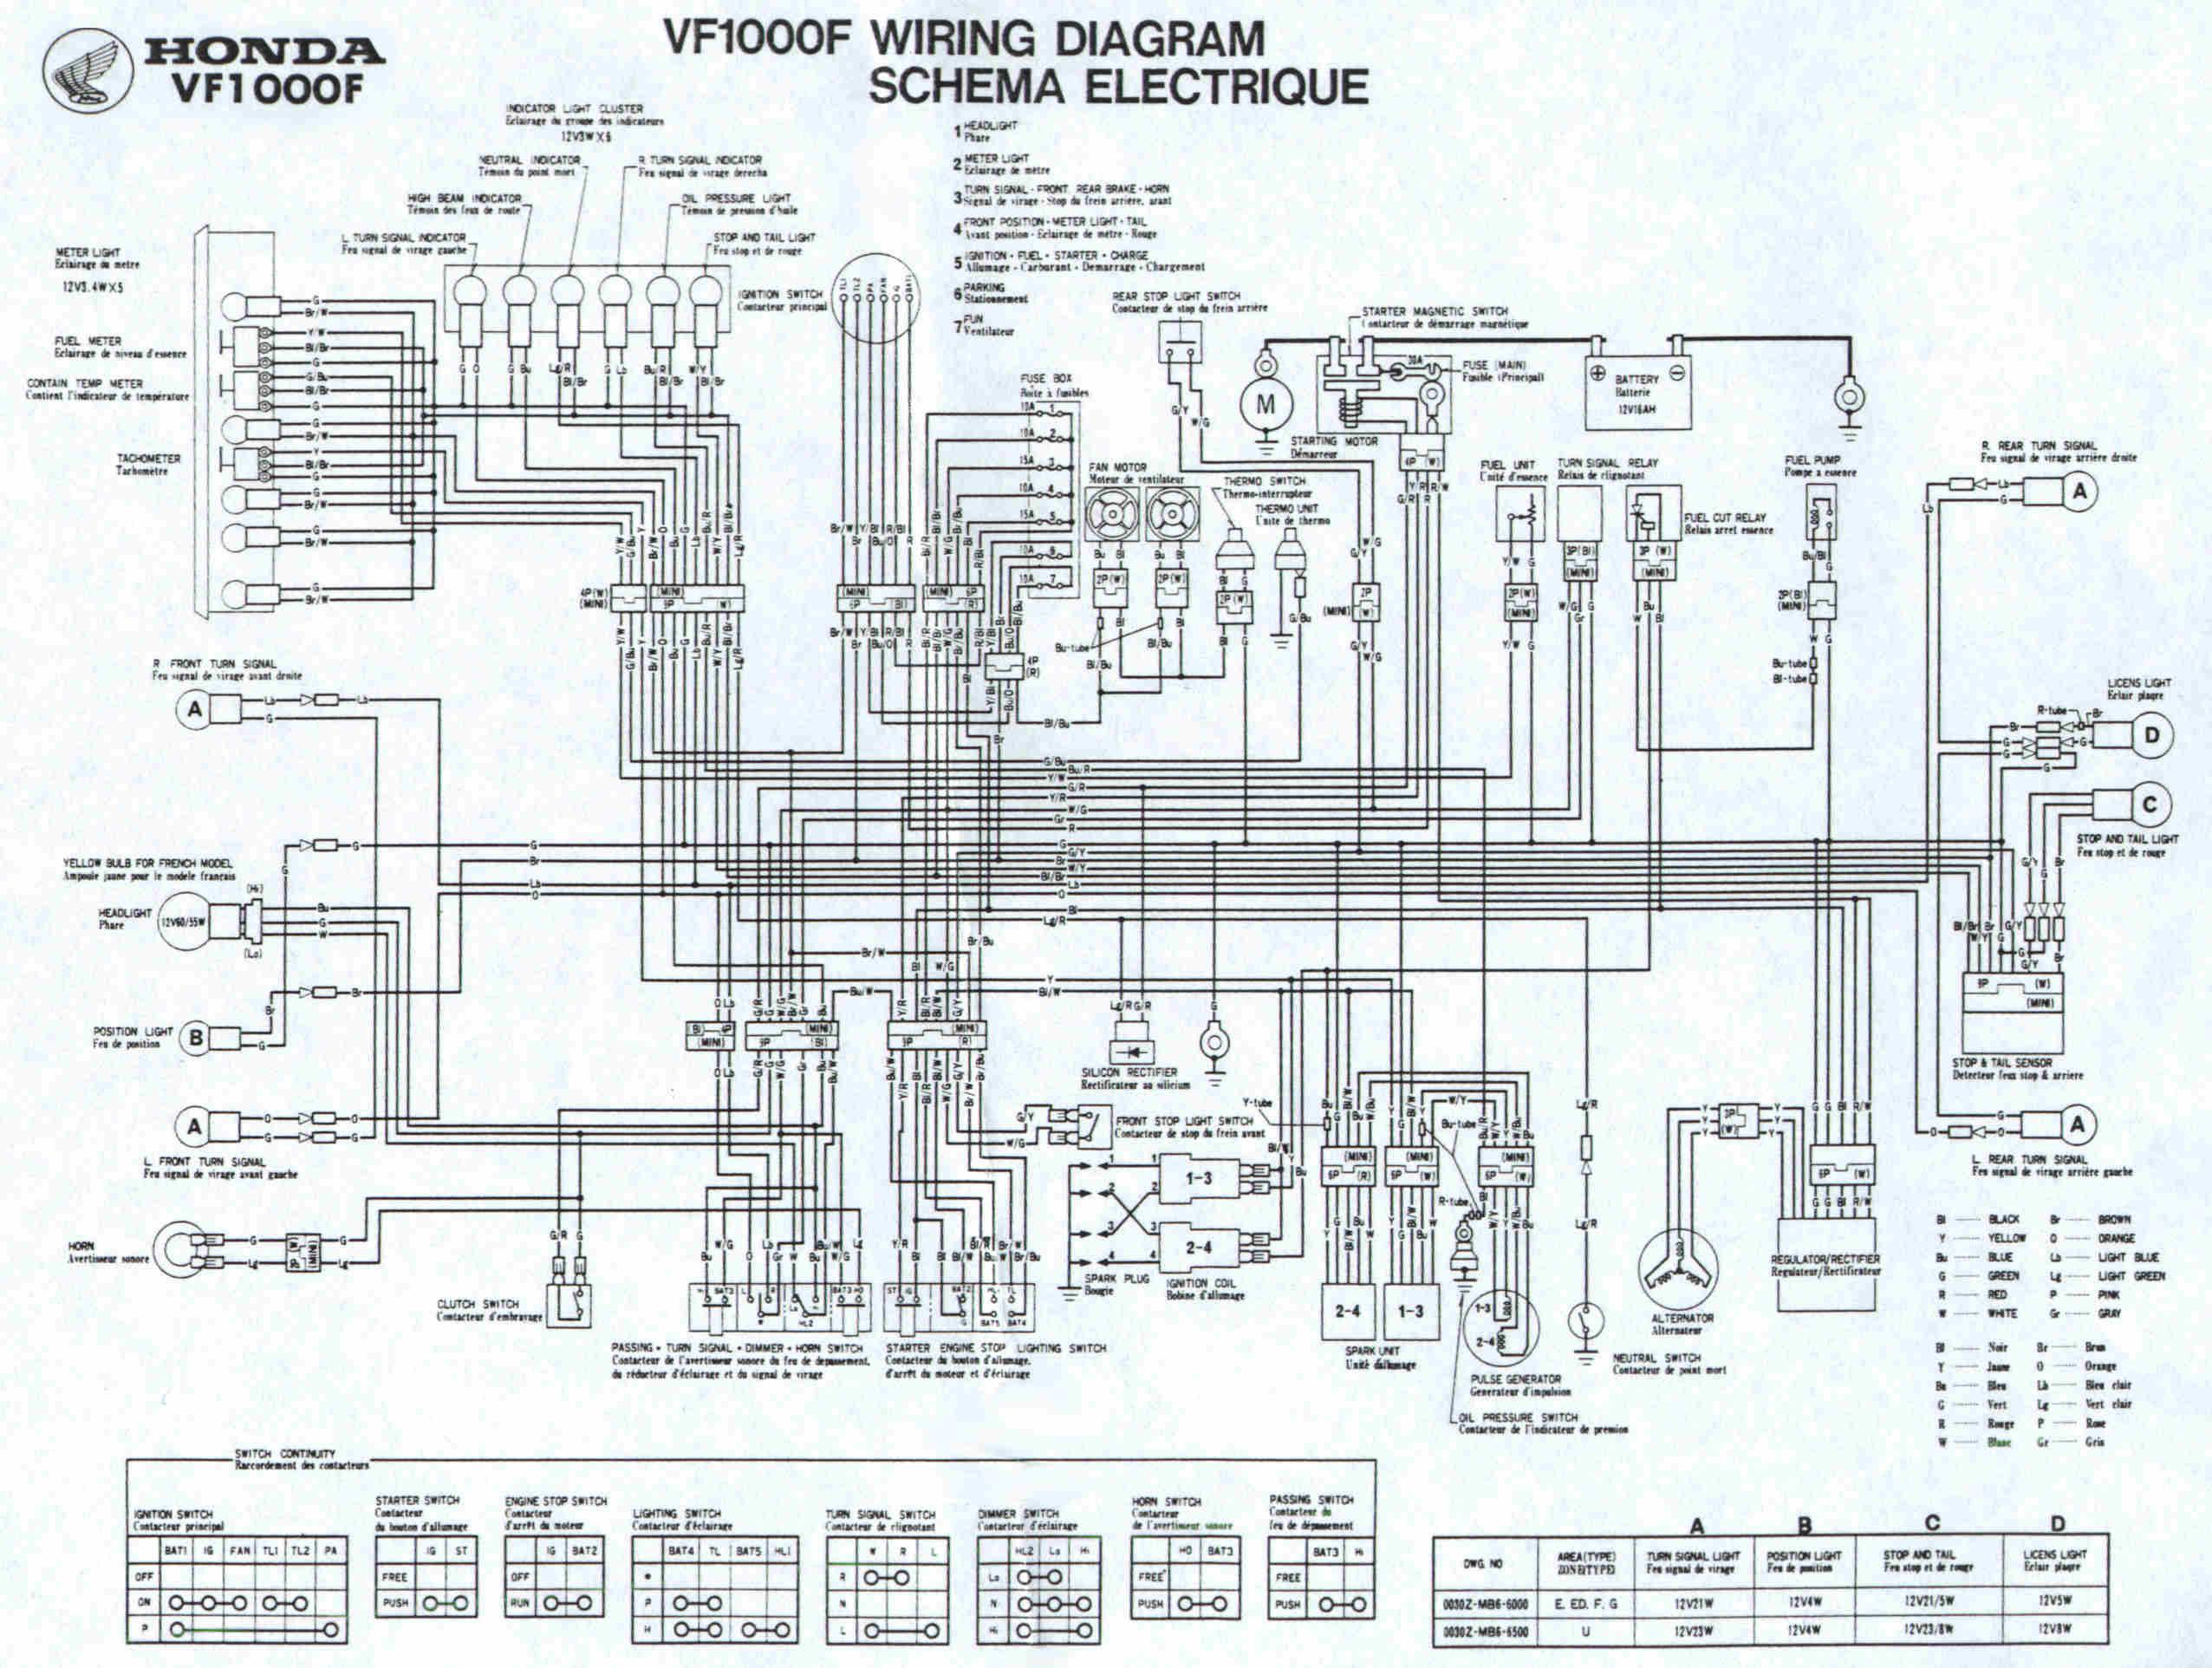 1994 kawasaki 220 bayou wiring diagram standby generator ignition get free